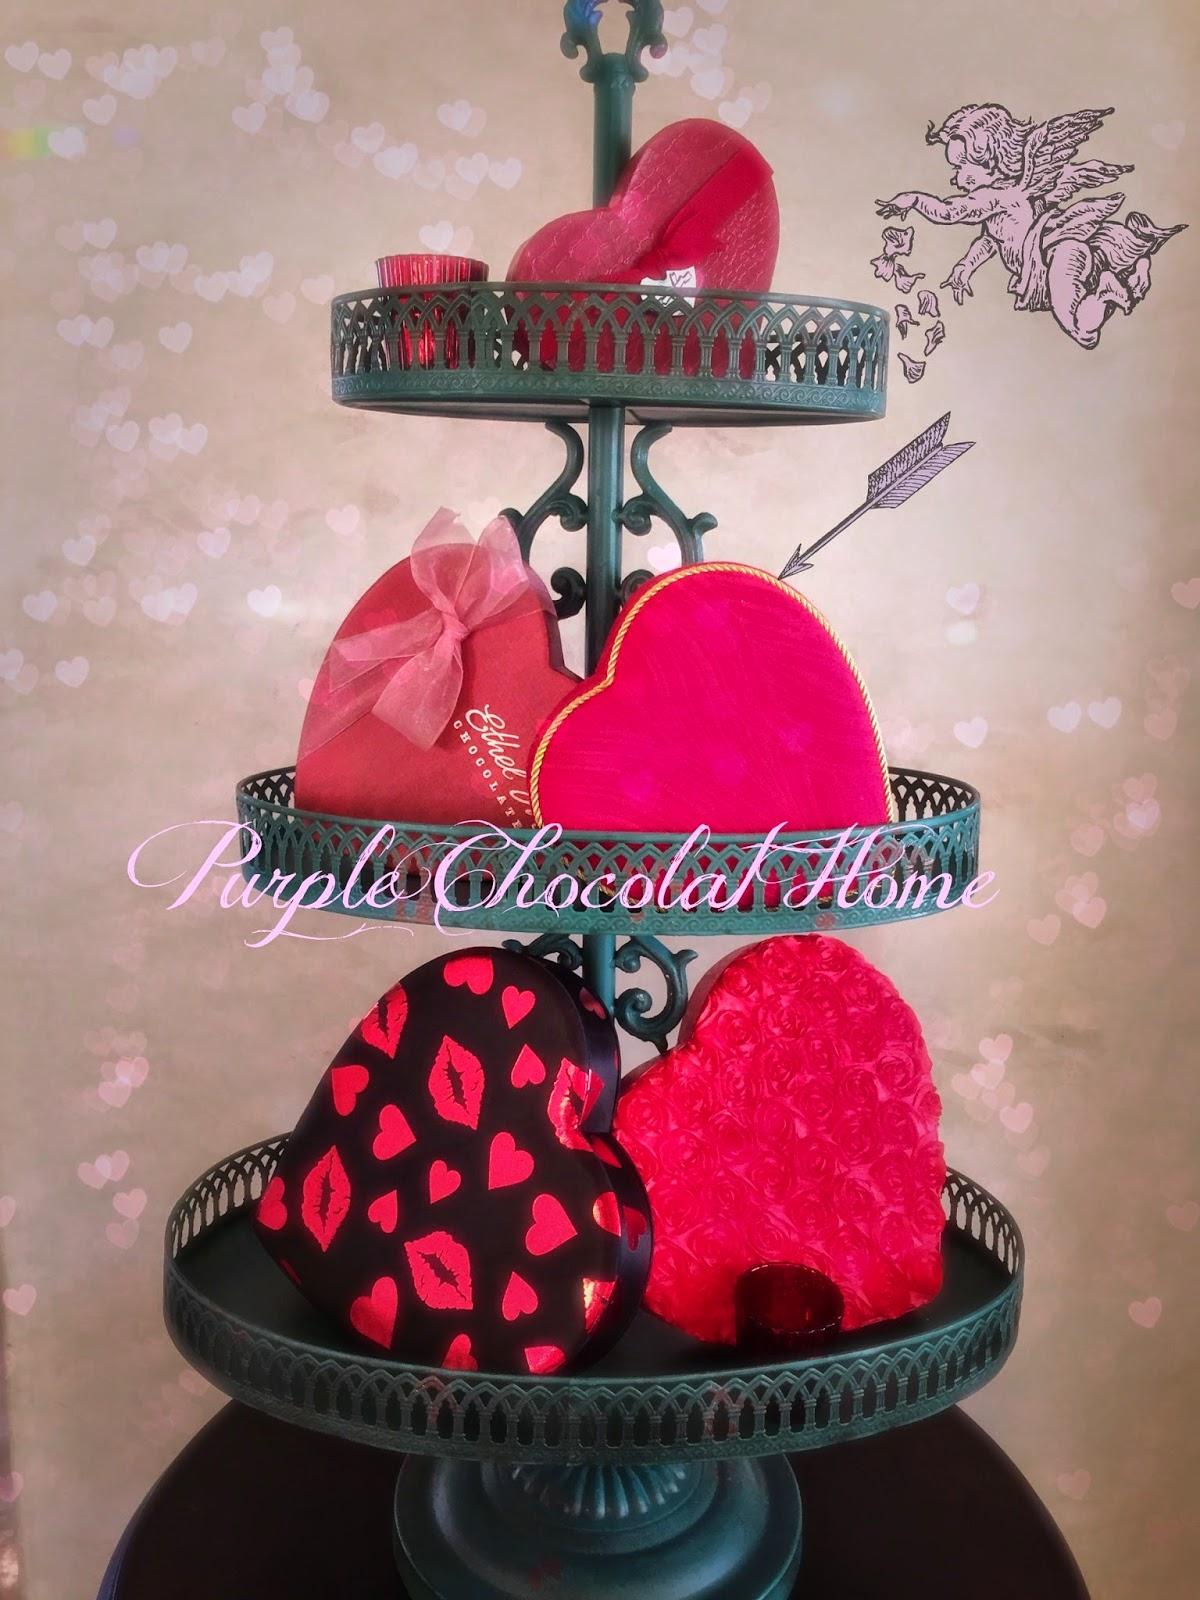 Valentine S Day Decor Purple Chocolat Home